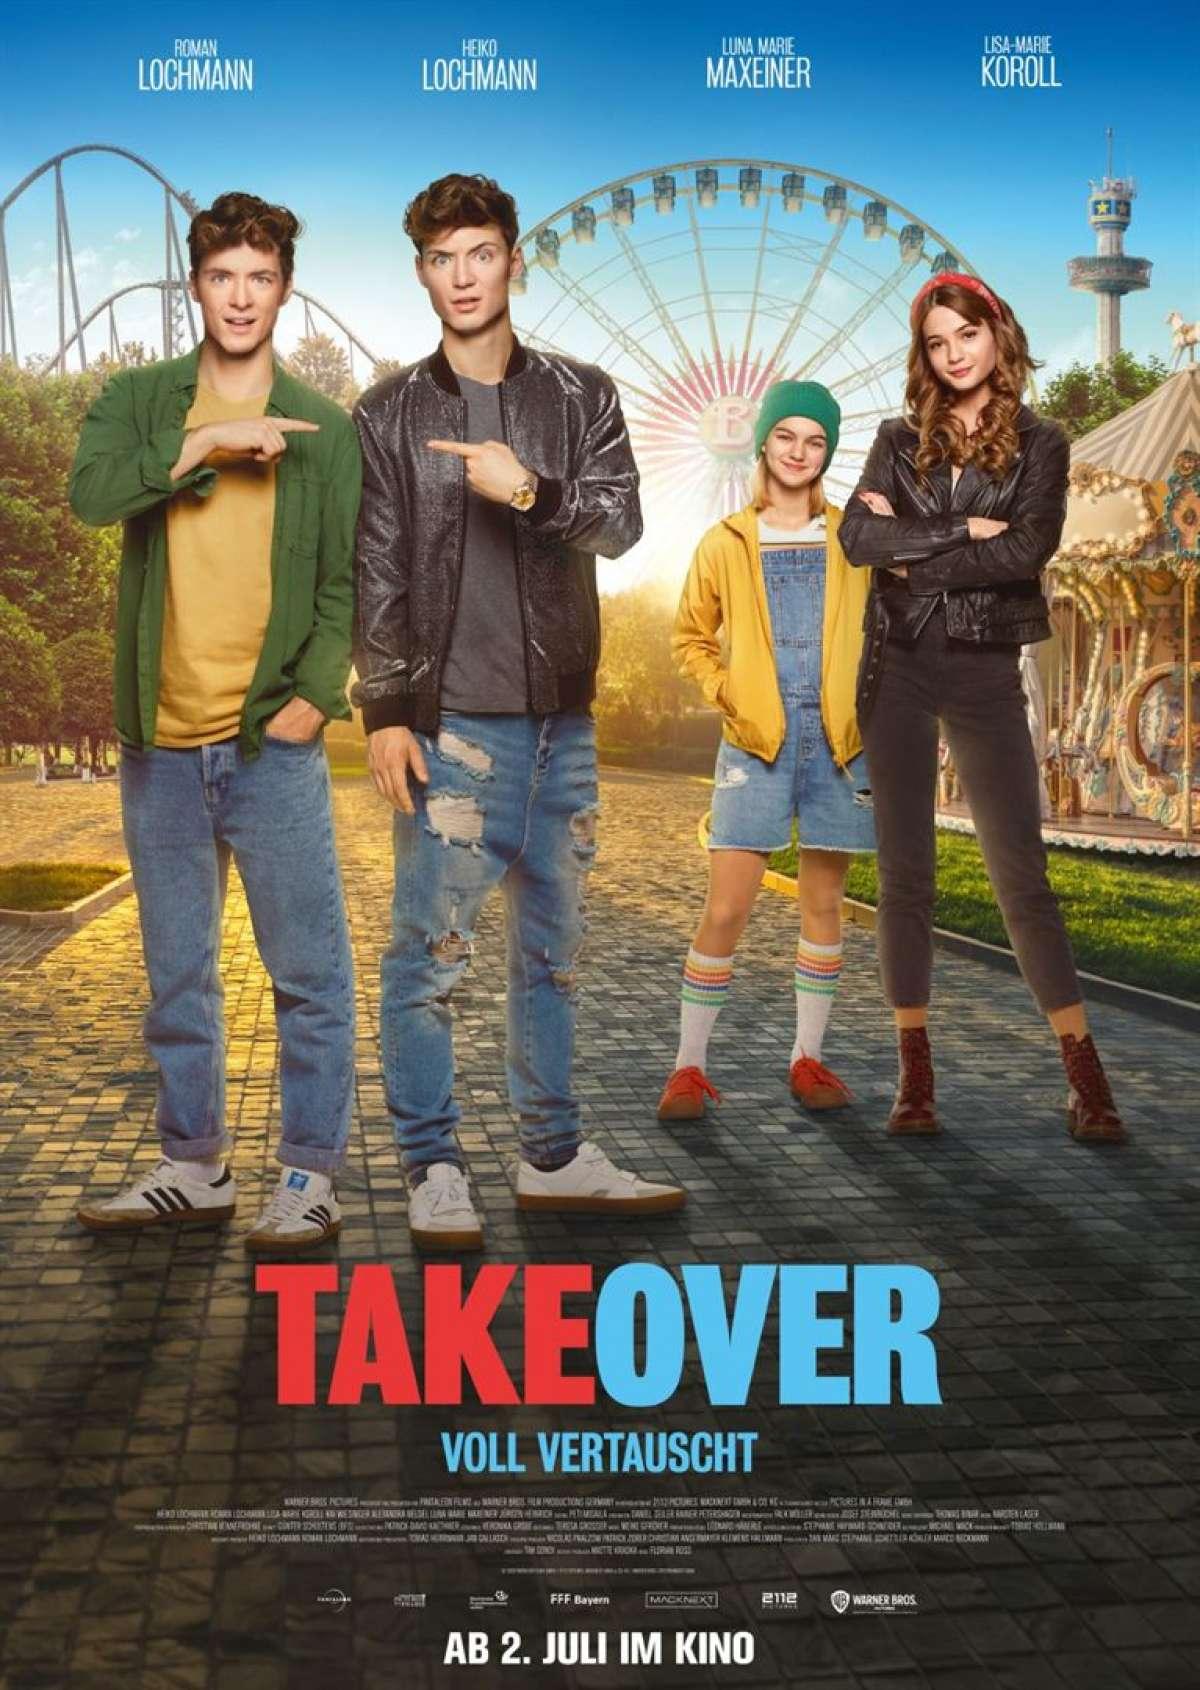 Takeover - Voll Vertauscht - Kino  - Bad Driburg